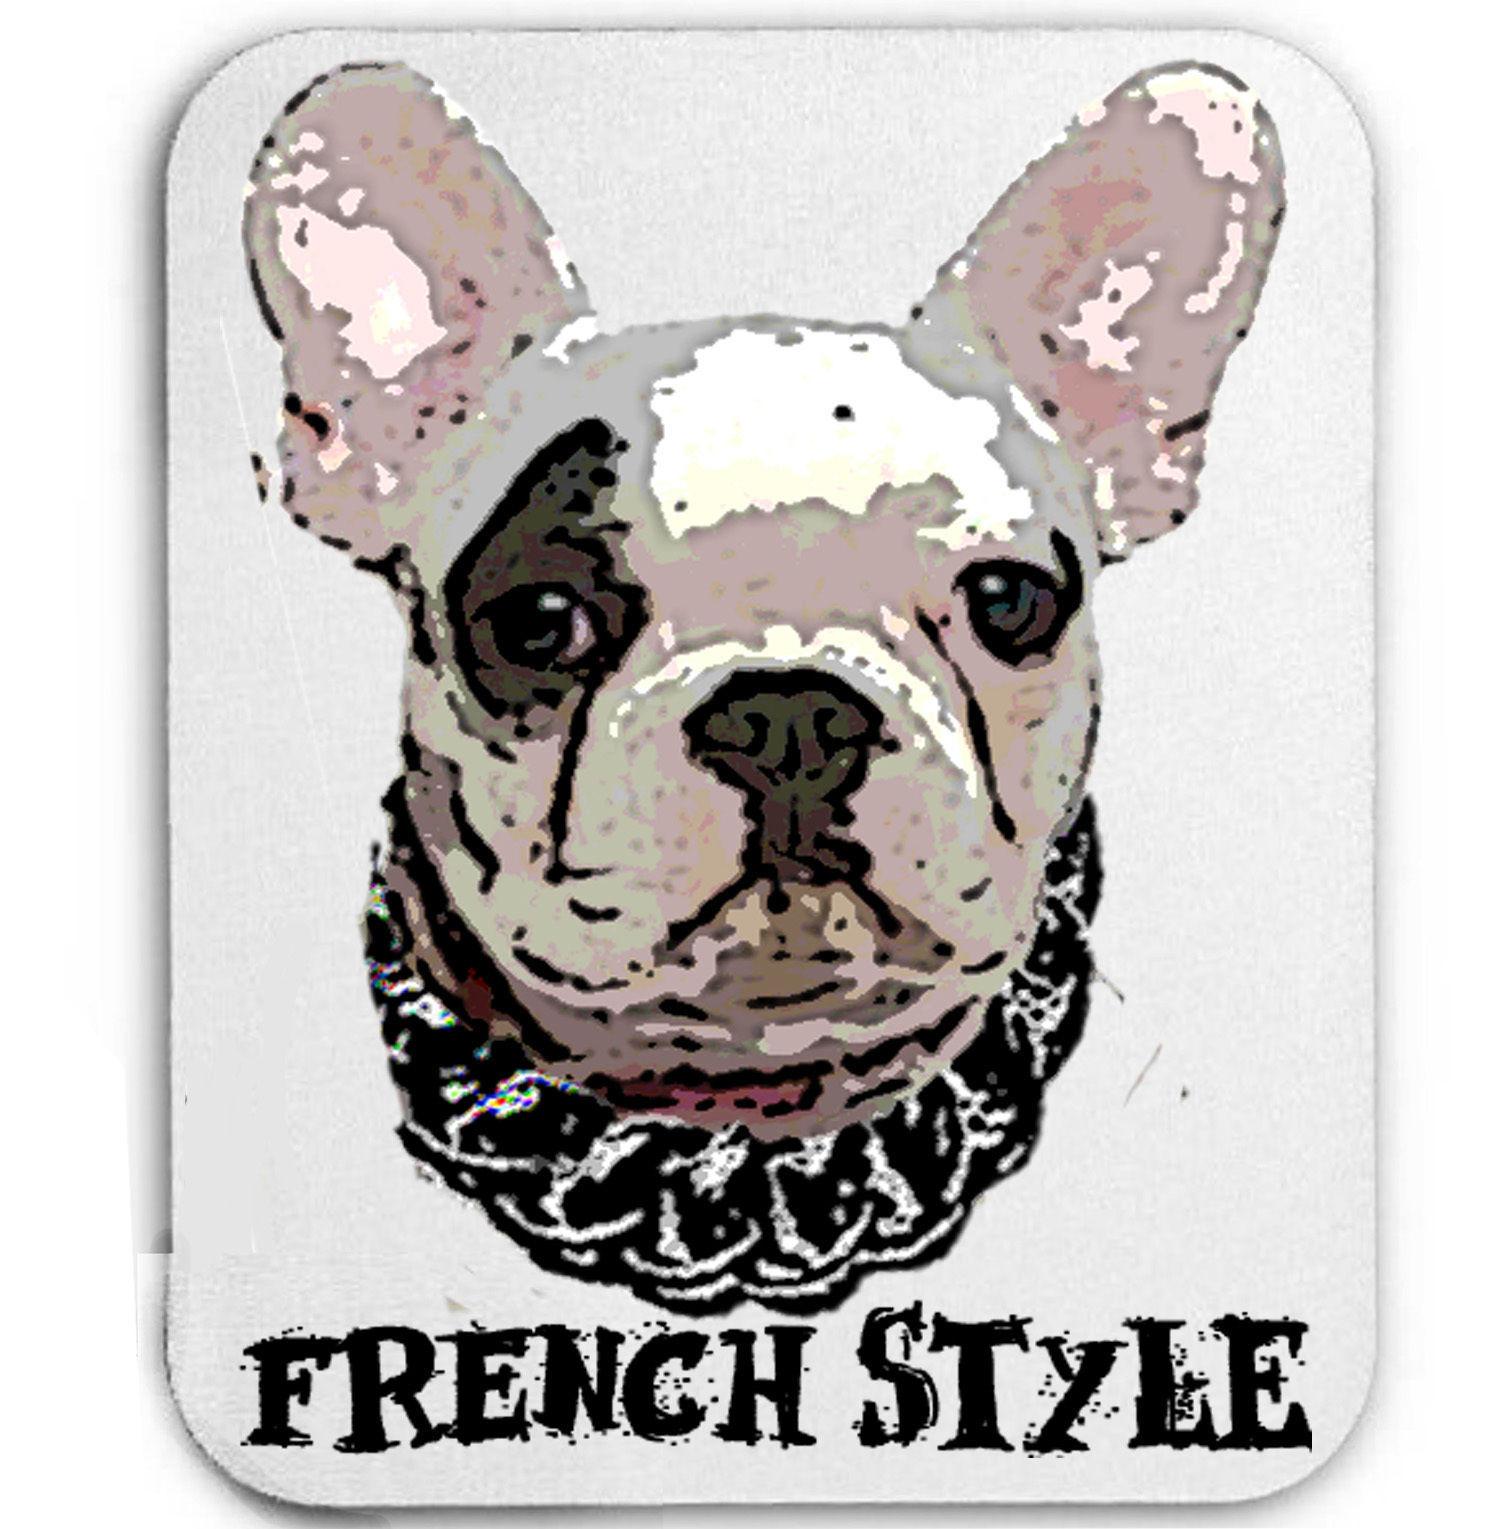 FRENCH BULLDOG FRENCH STYLE  - MOUSE MAT/PAD AMAZING DESIGN